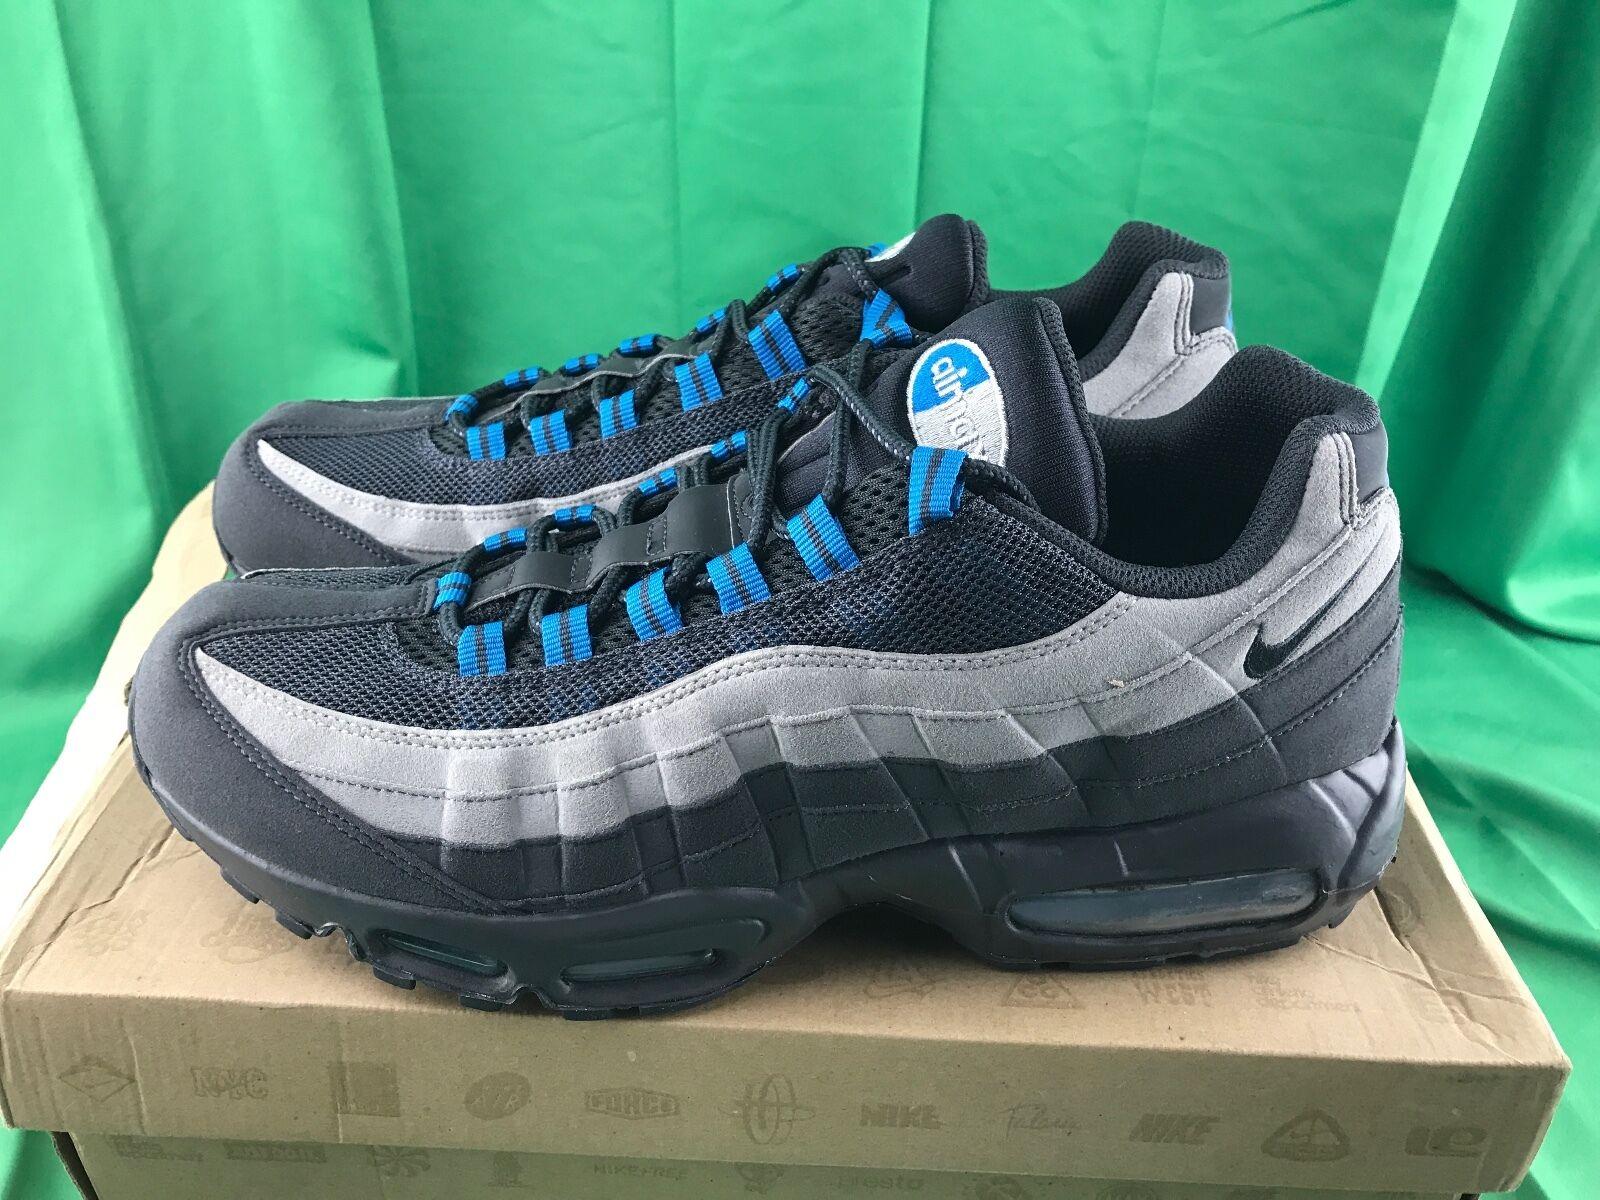 nike grauen air max 95 anthrazit grauen nike neutrale blaue männer größe 12 609048-052 og 2011 d9a0f4